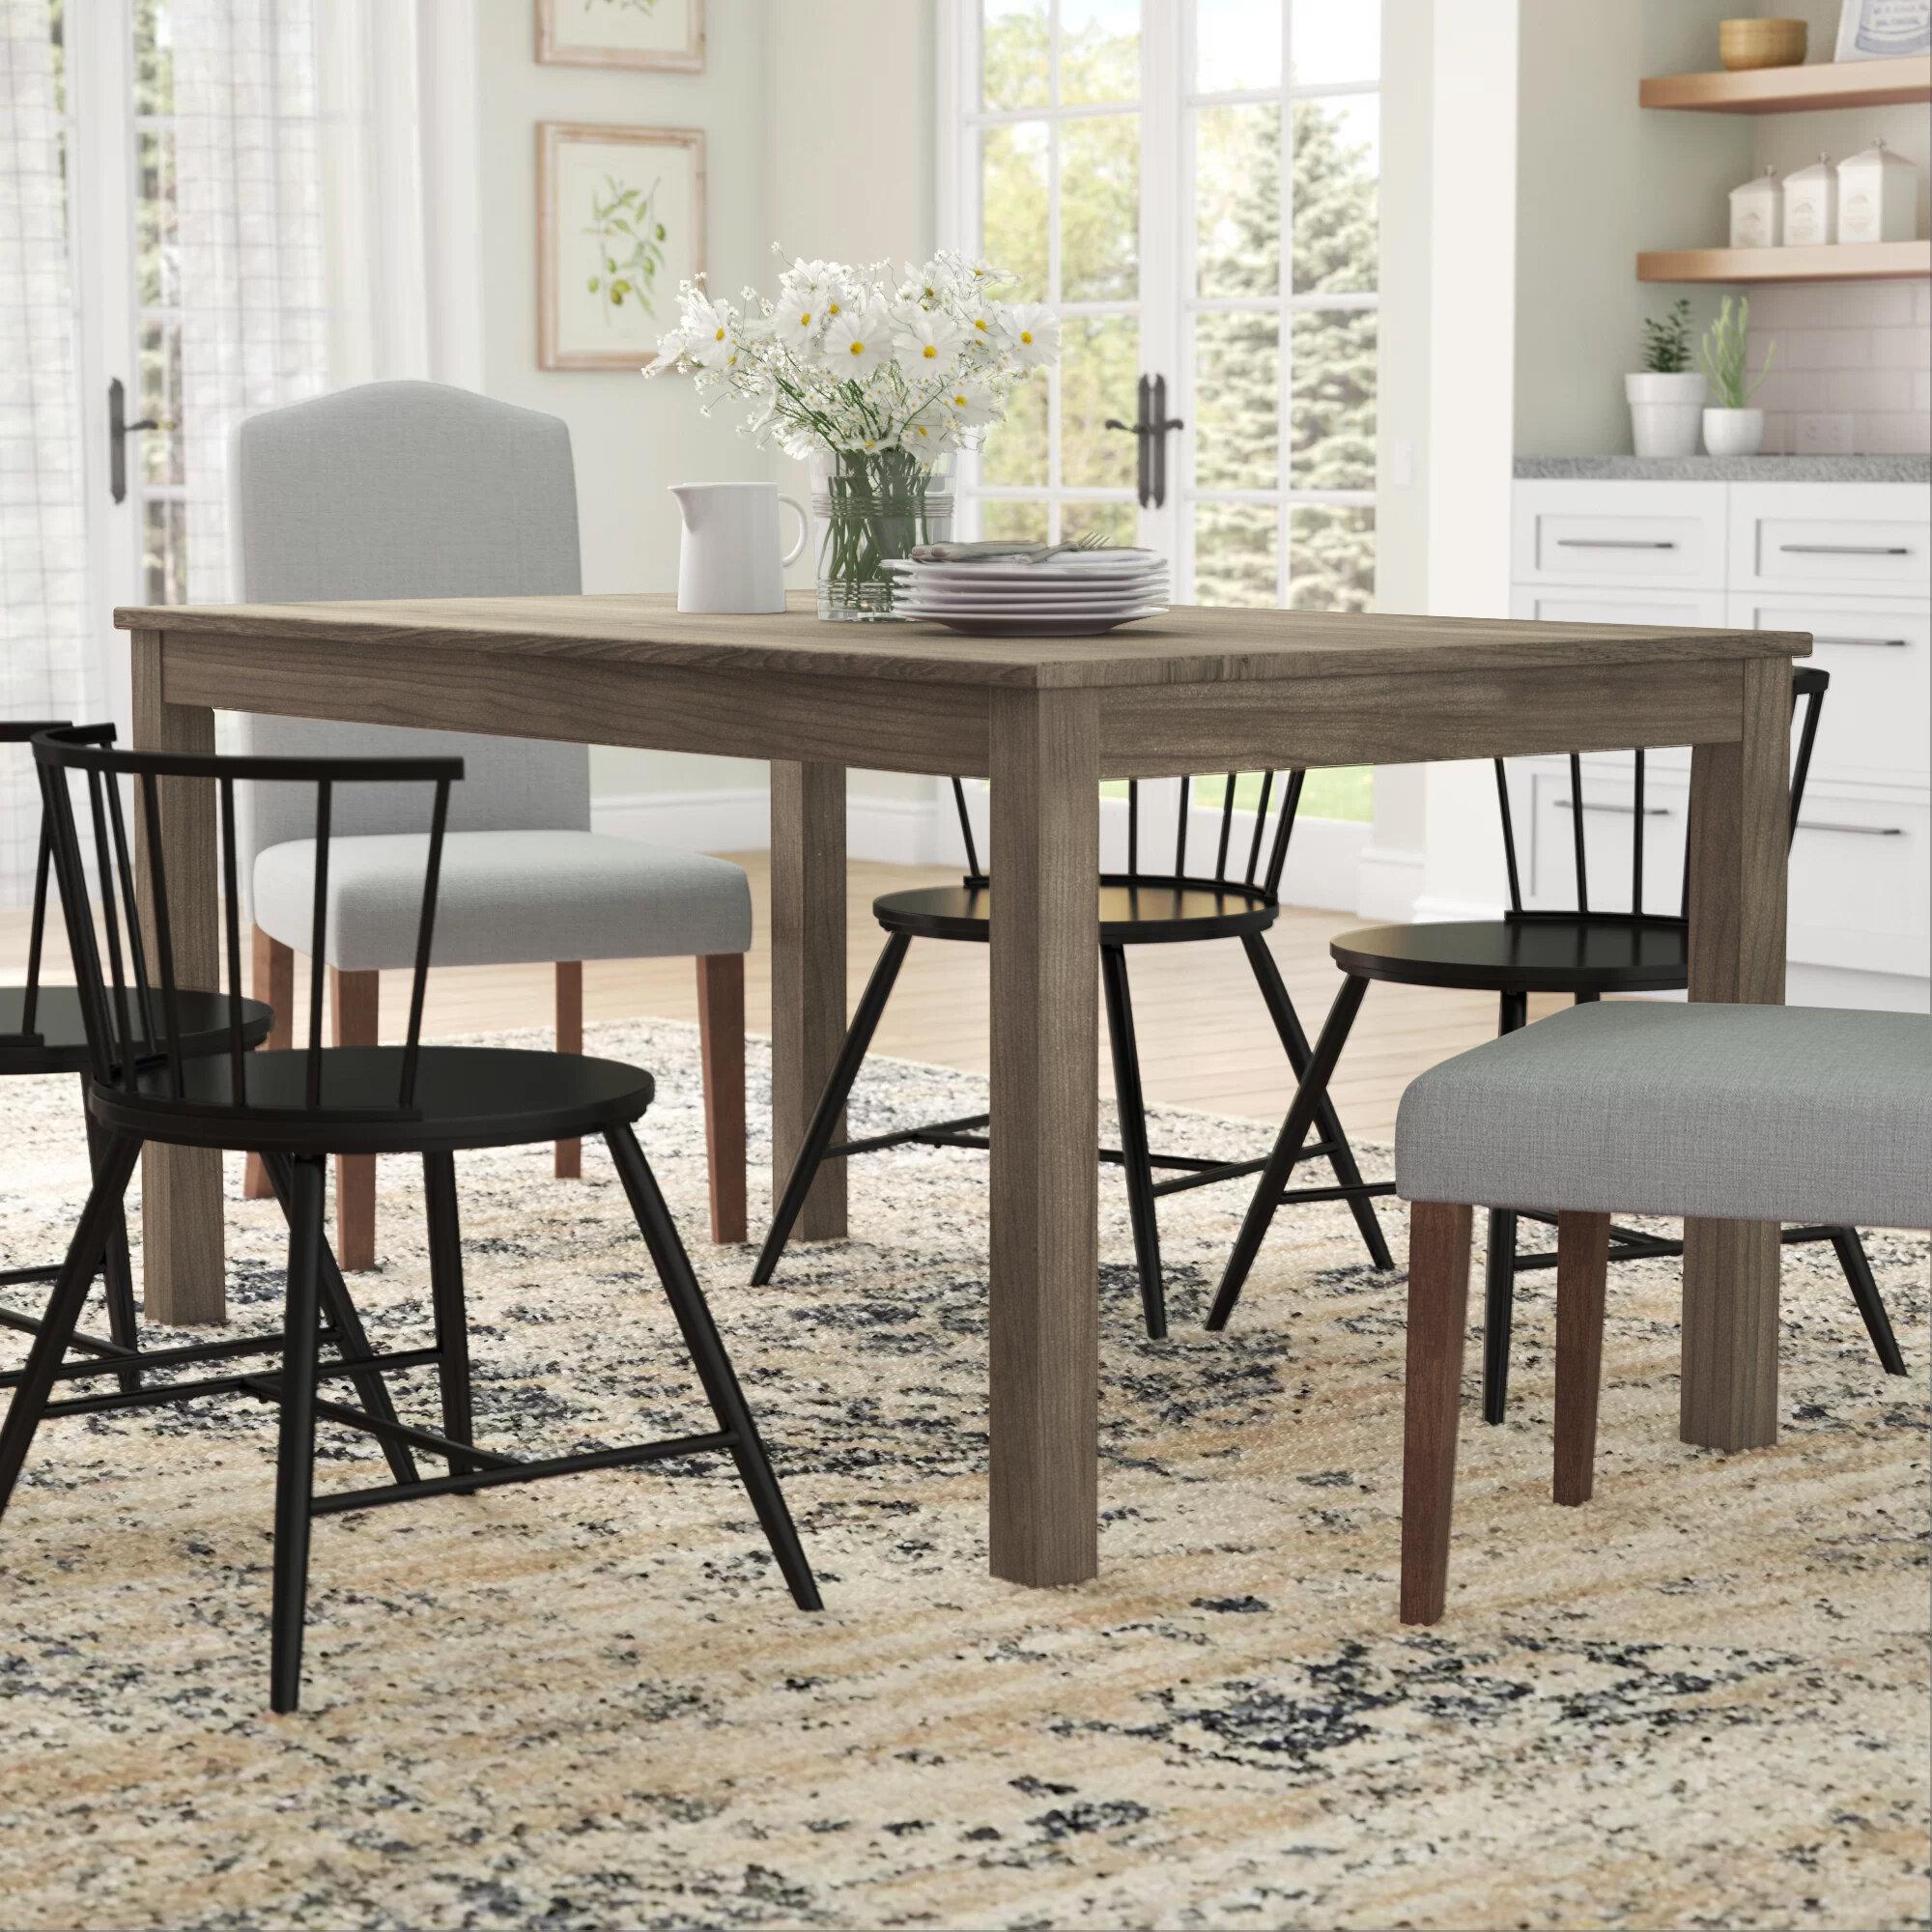 Gracie Oaks Selina Wood Dining Table Reviews Wayfair Ca